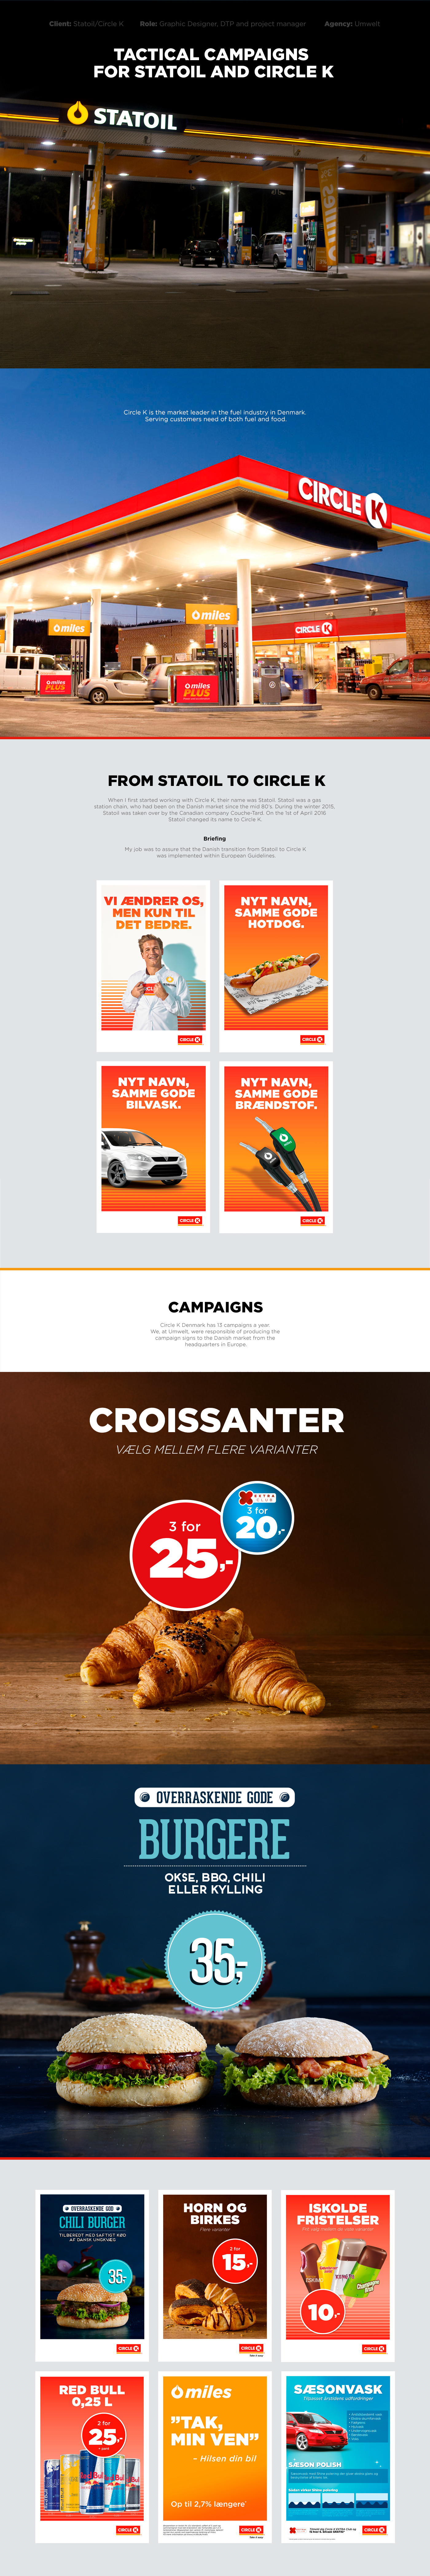 Circle K Umwelt tactical campaigns Convenience Store graphic design  Project Management Statoil